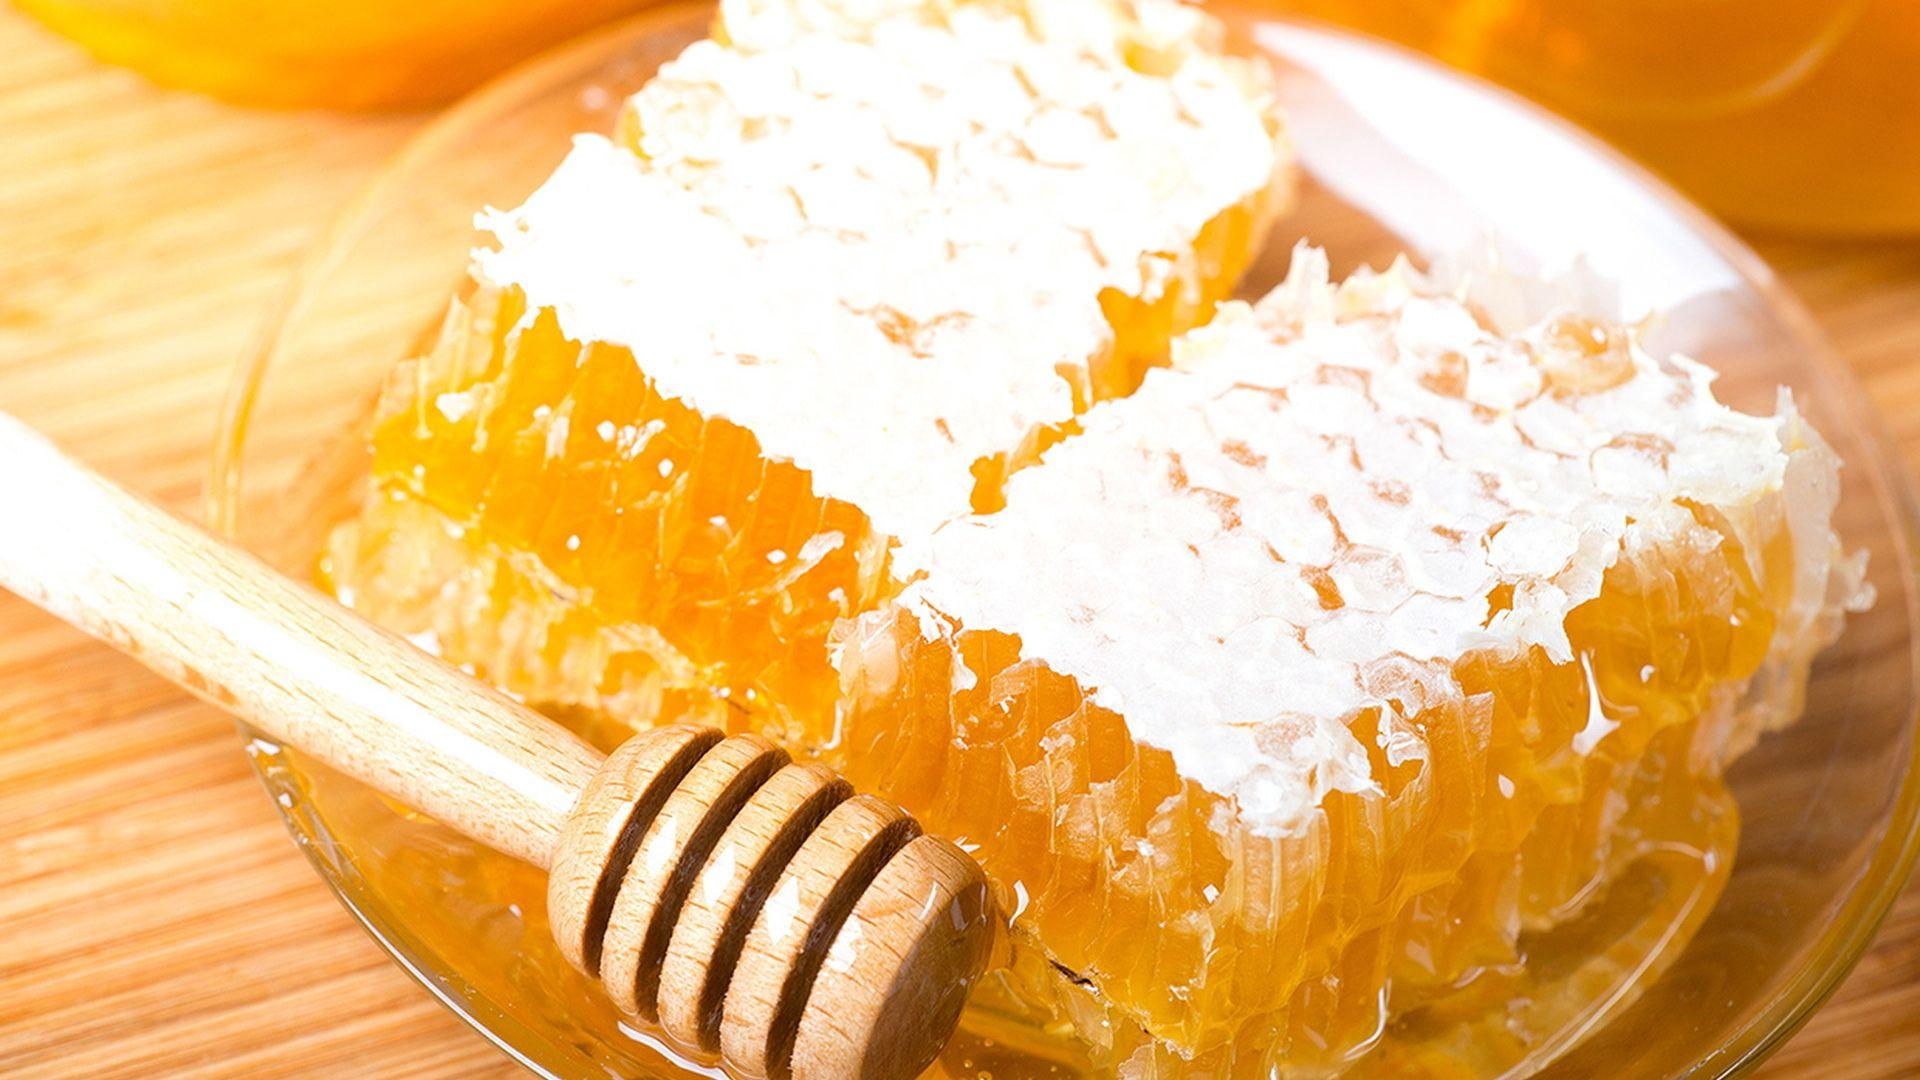 Honey wallpaper photo full hd